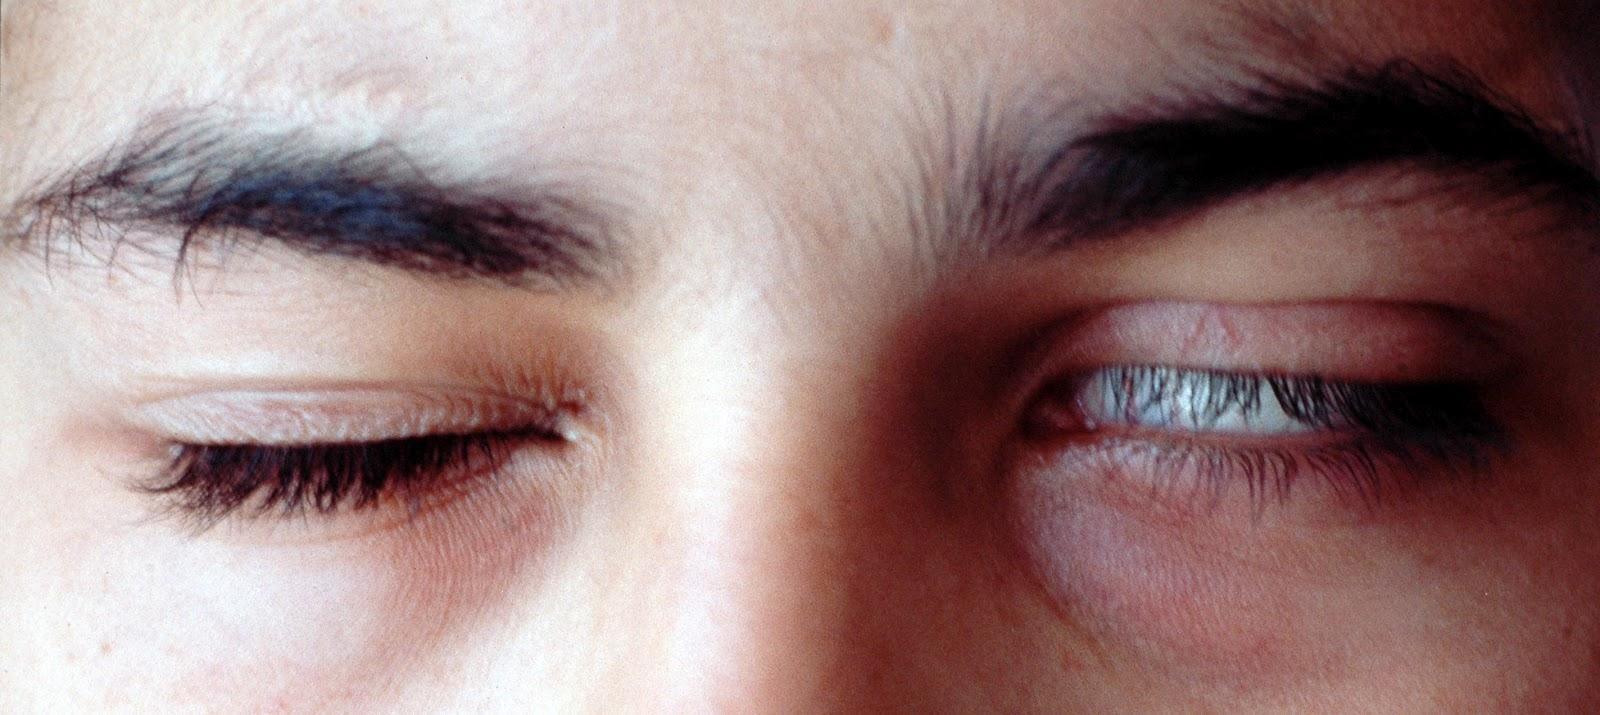 fenómeno ocular